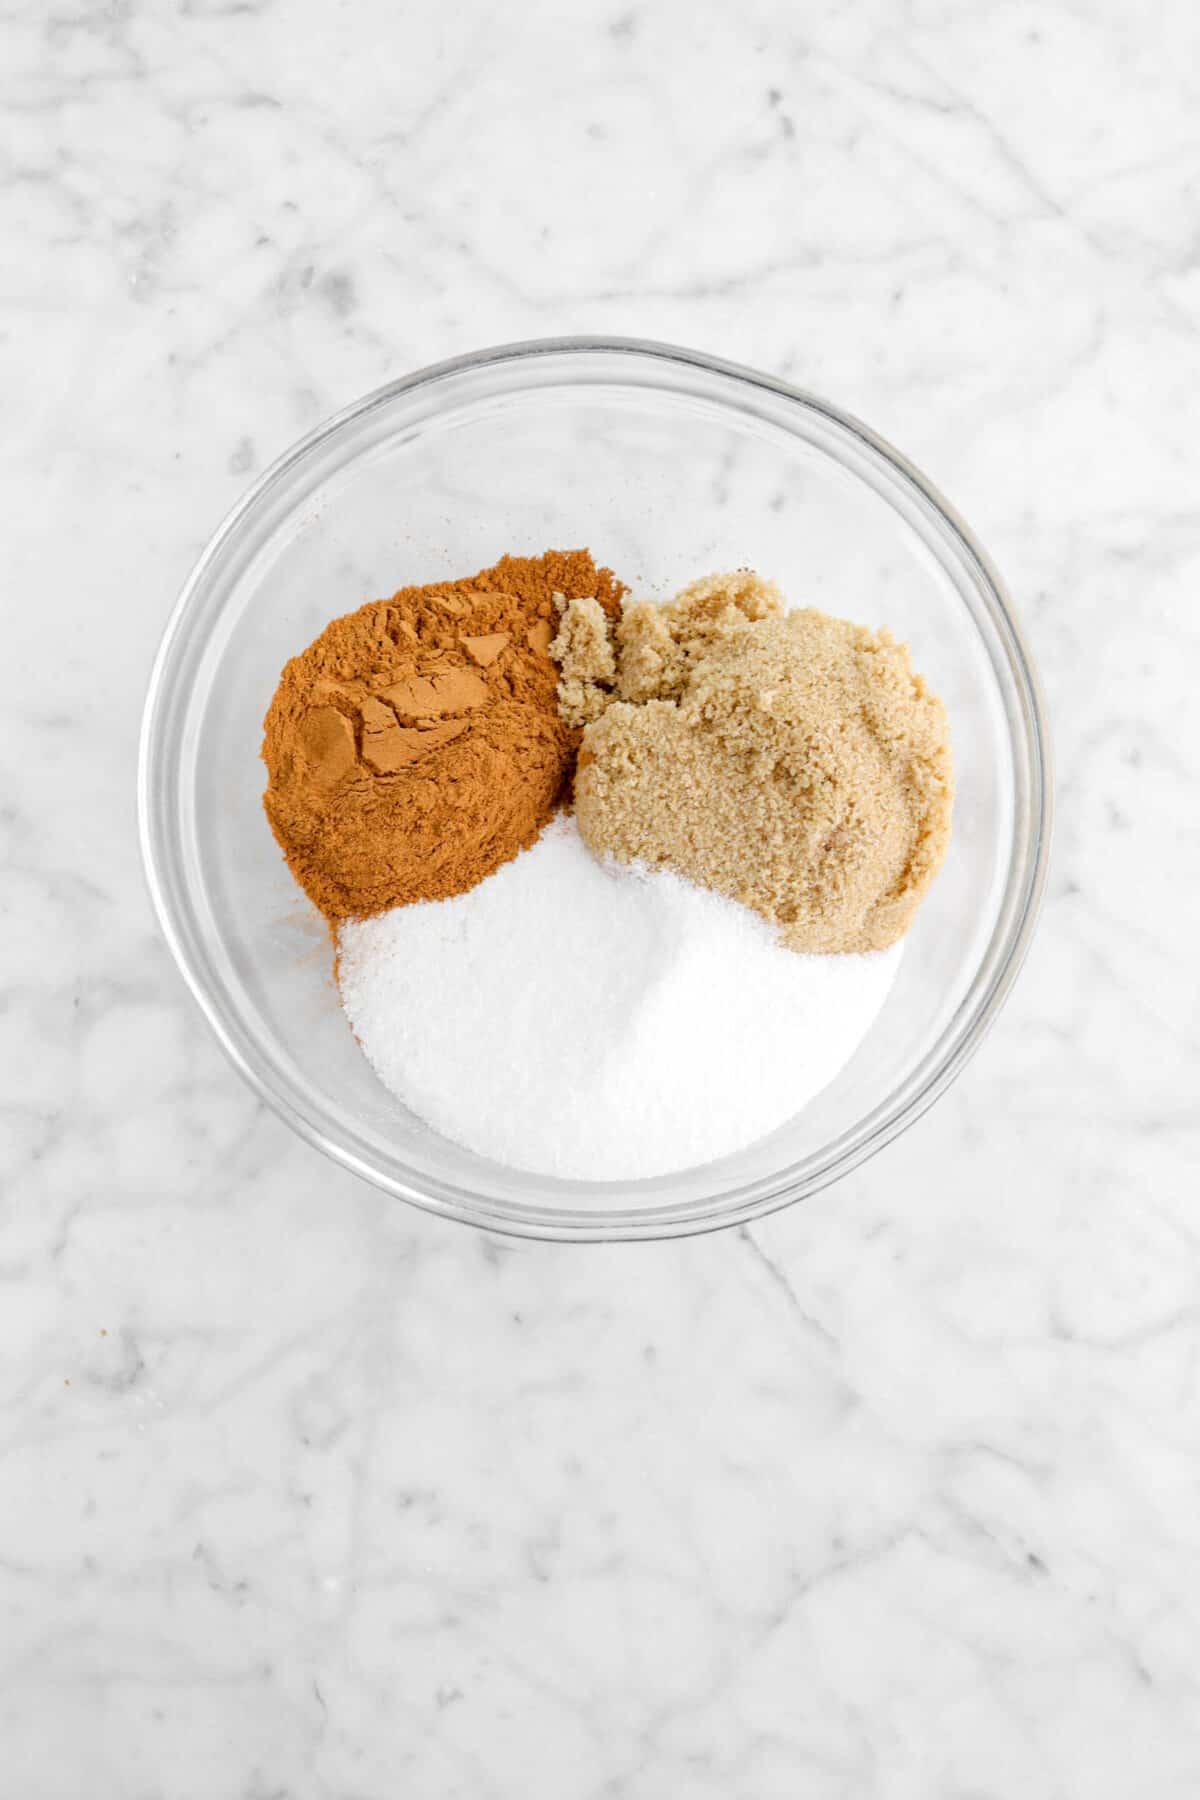 cinnamon, brown sugar, and white sugar in a glass bowl